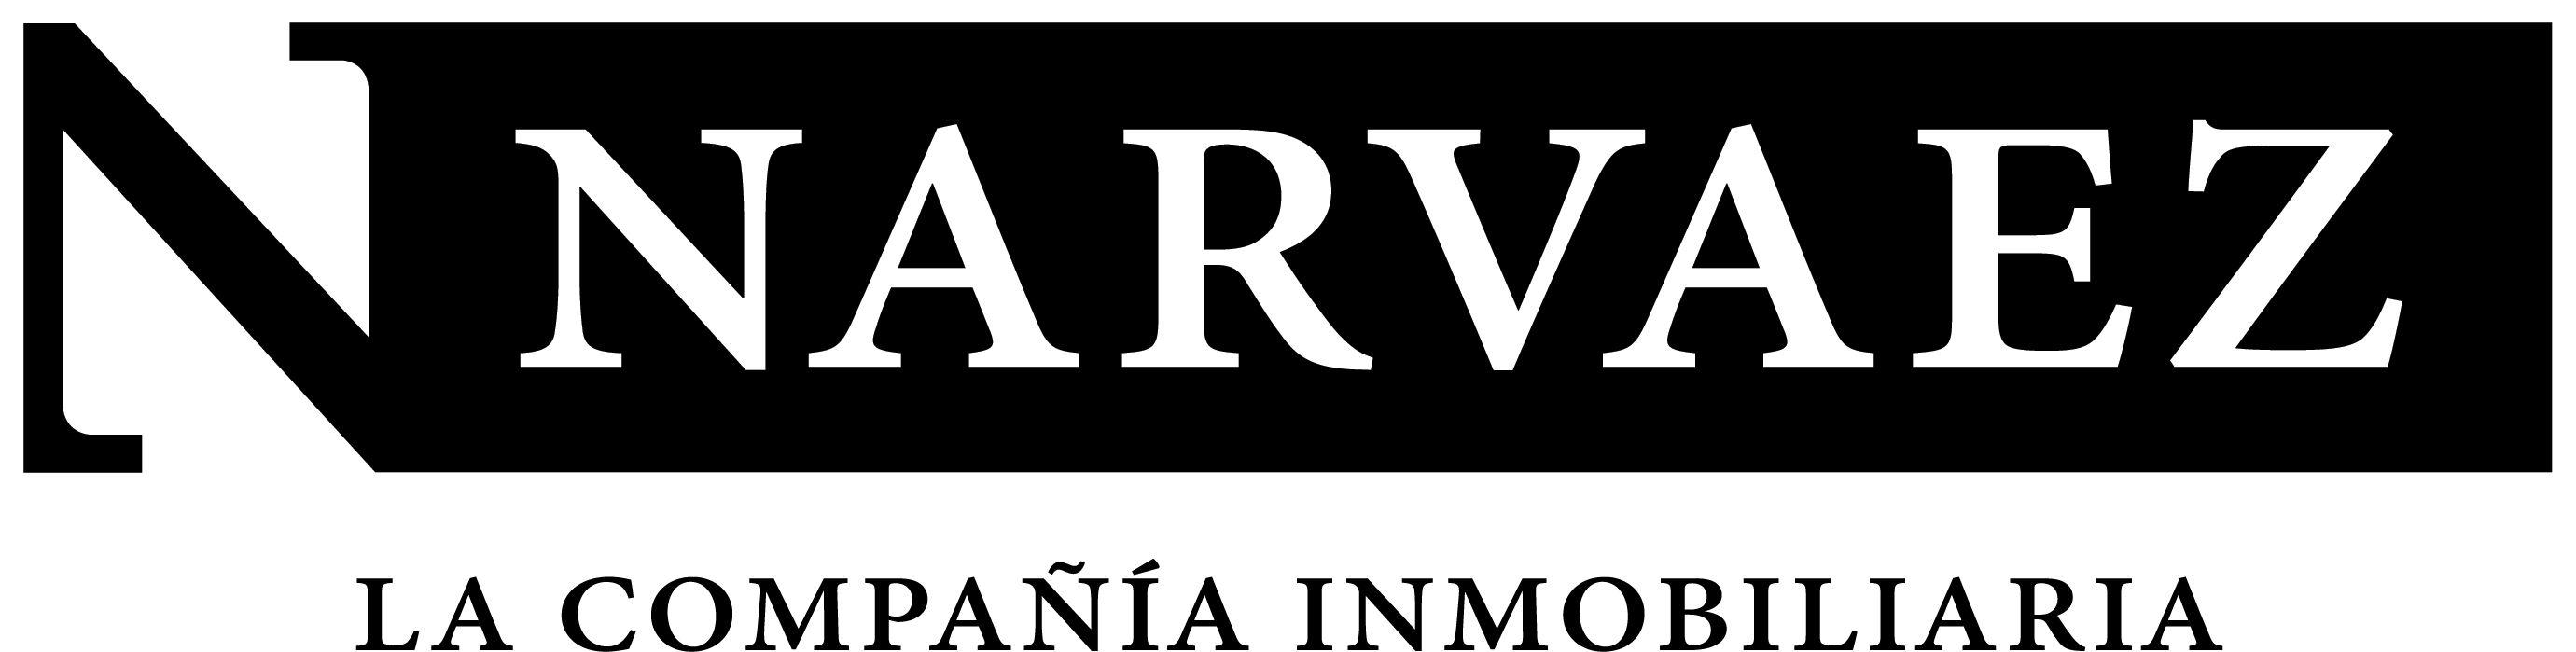 Logo de  Narvaezinmobiliaria